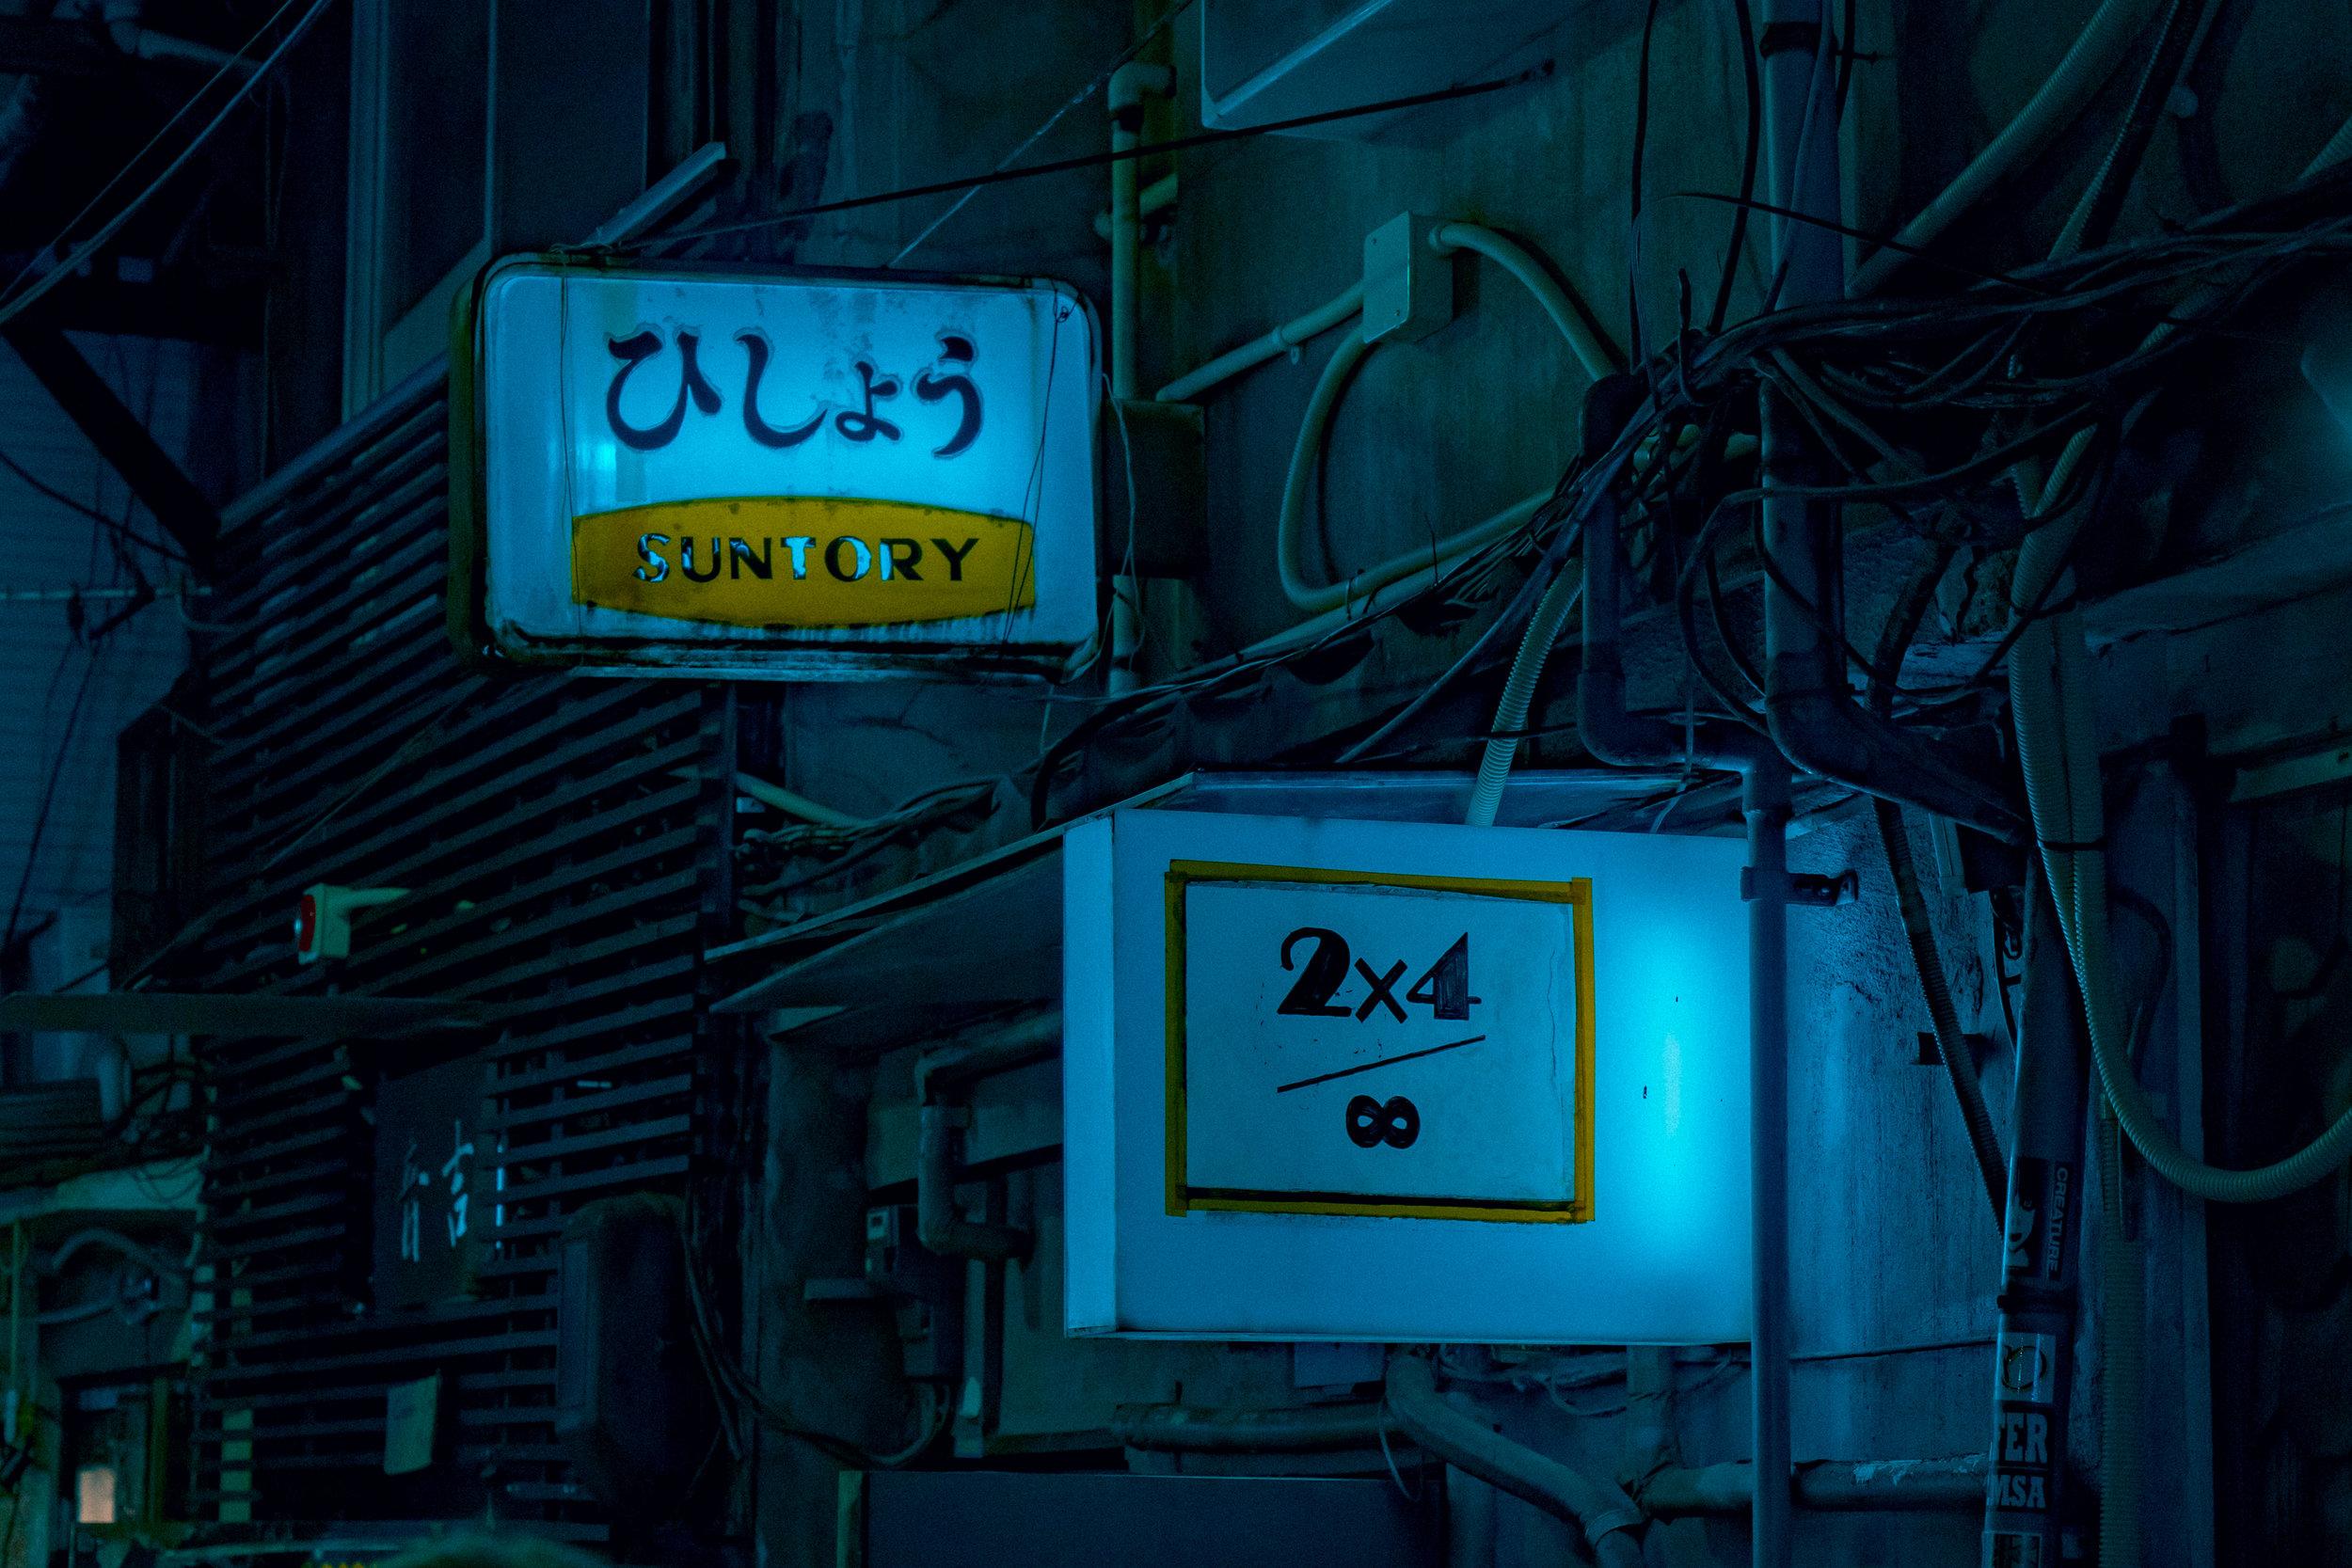 Shinjuku_GoldenGai-2.jpg